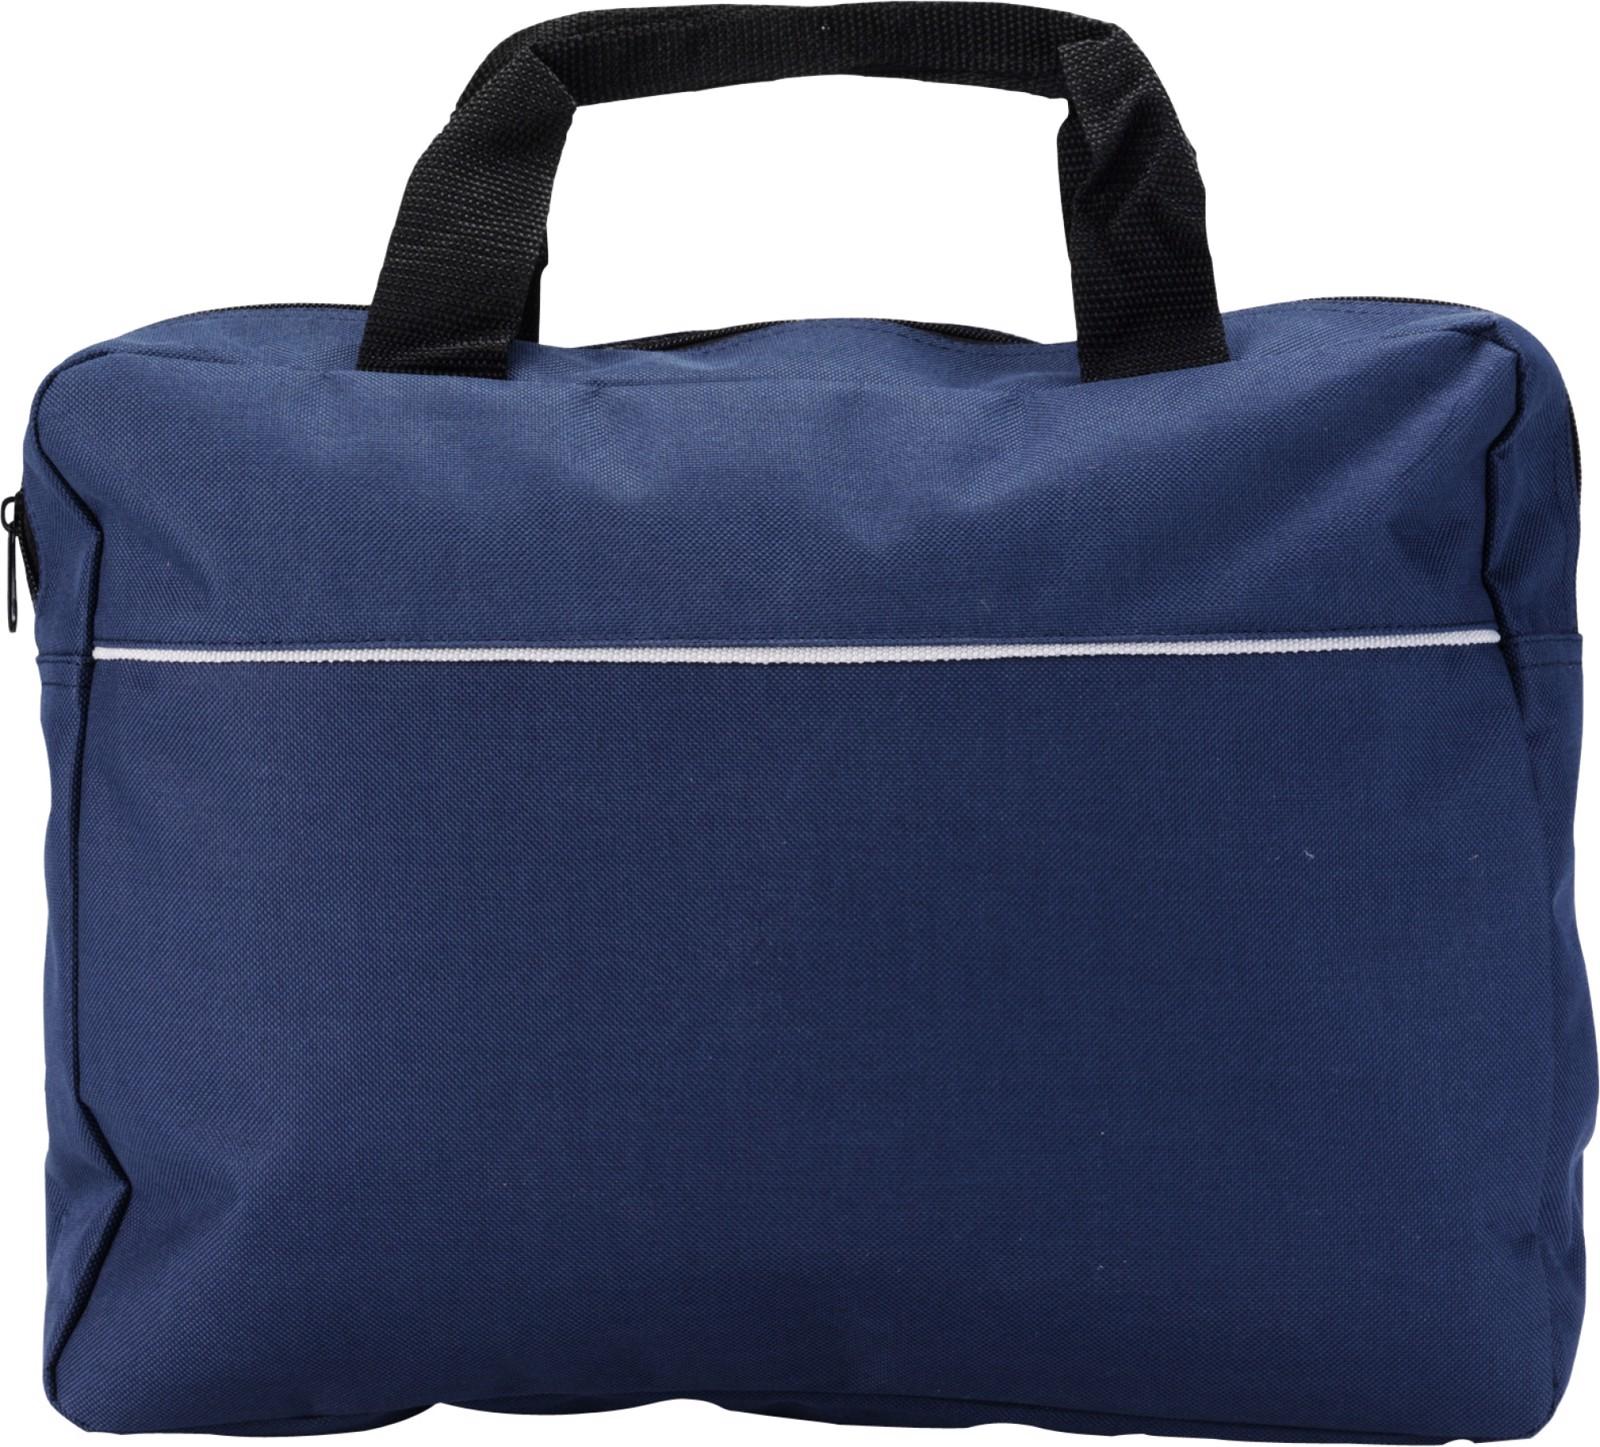 Polyester (600D) document bag - Blue